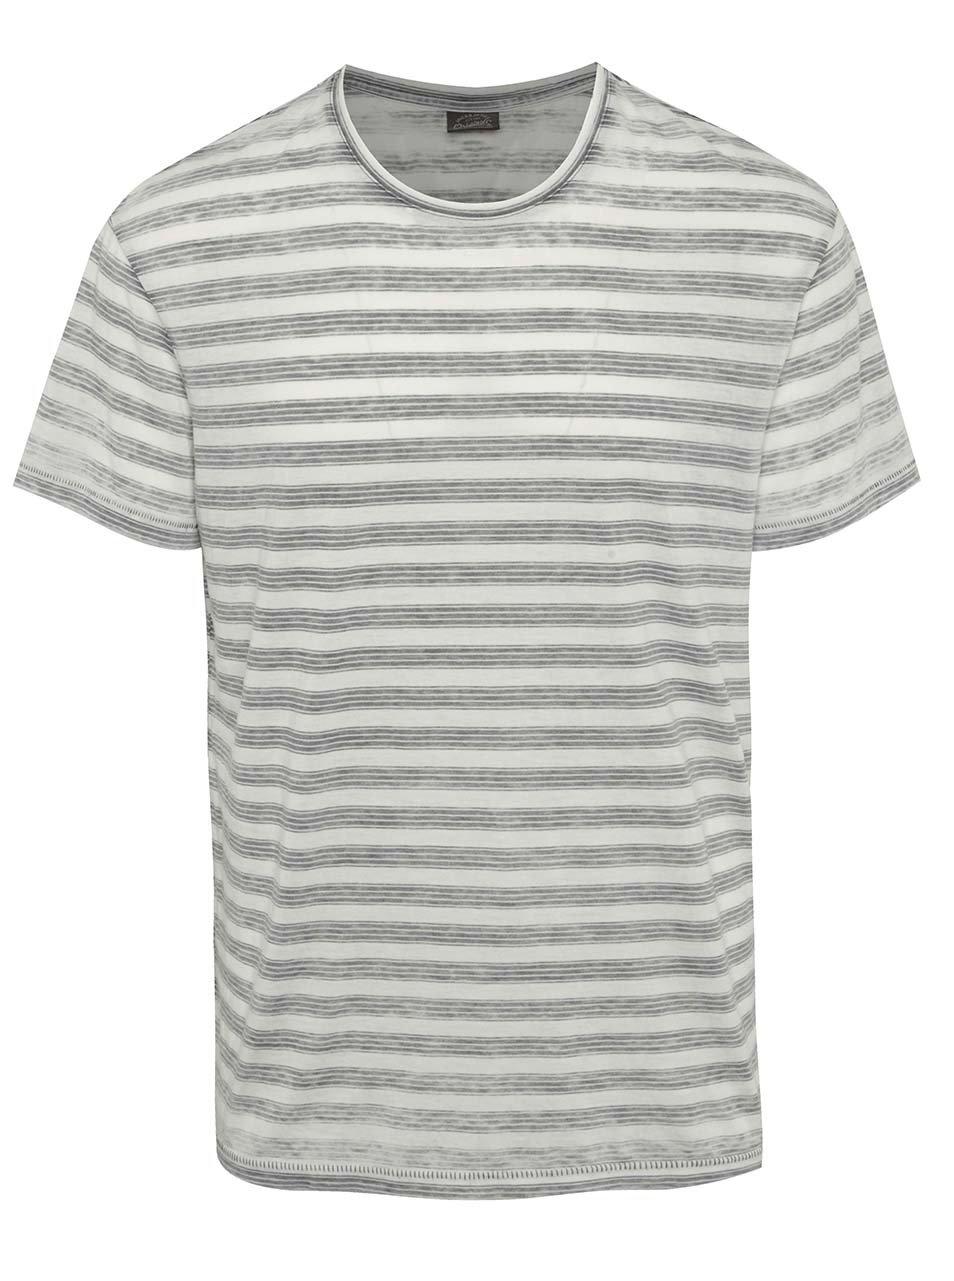 Bílé pruhované triko Jack & Jones Burn